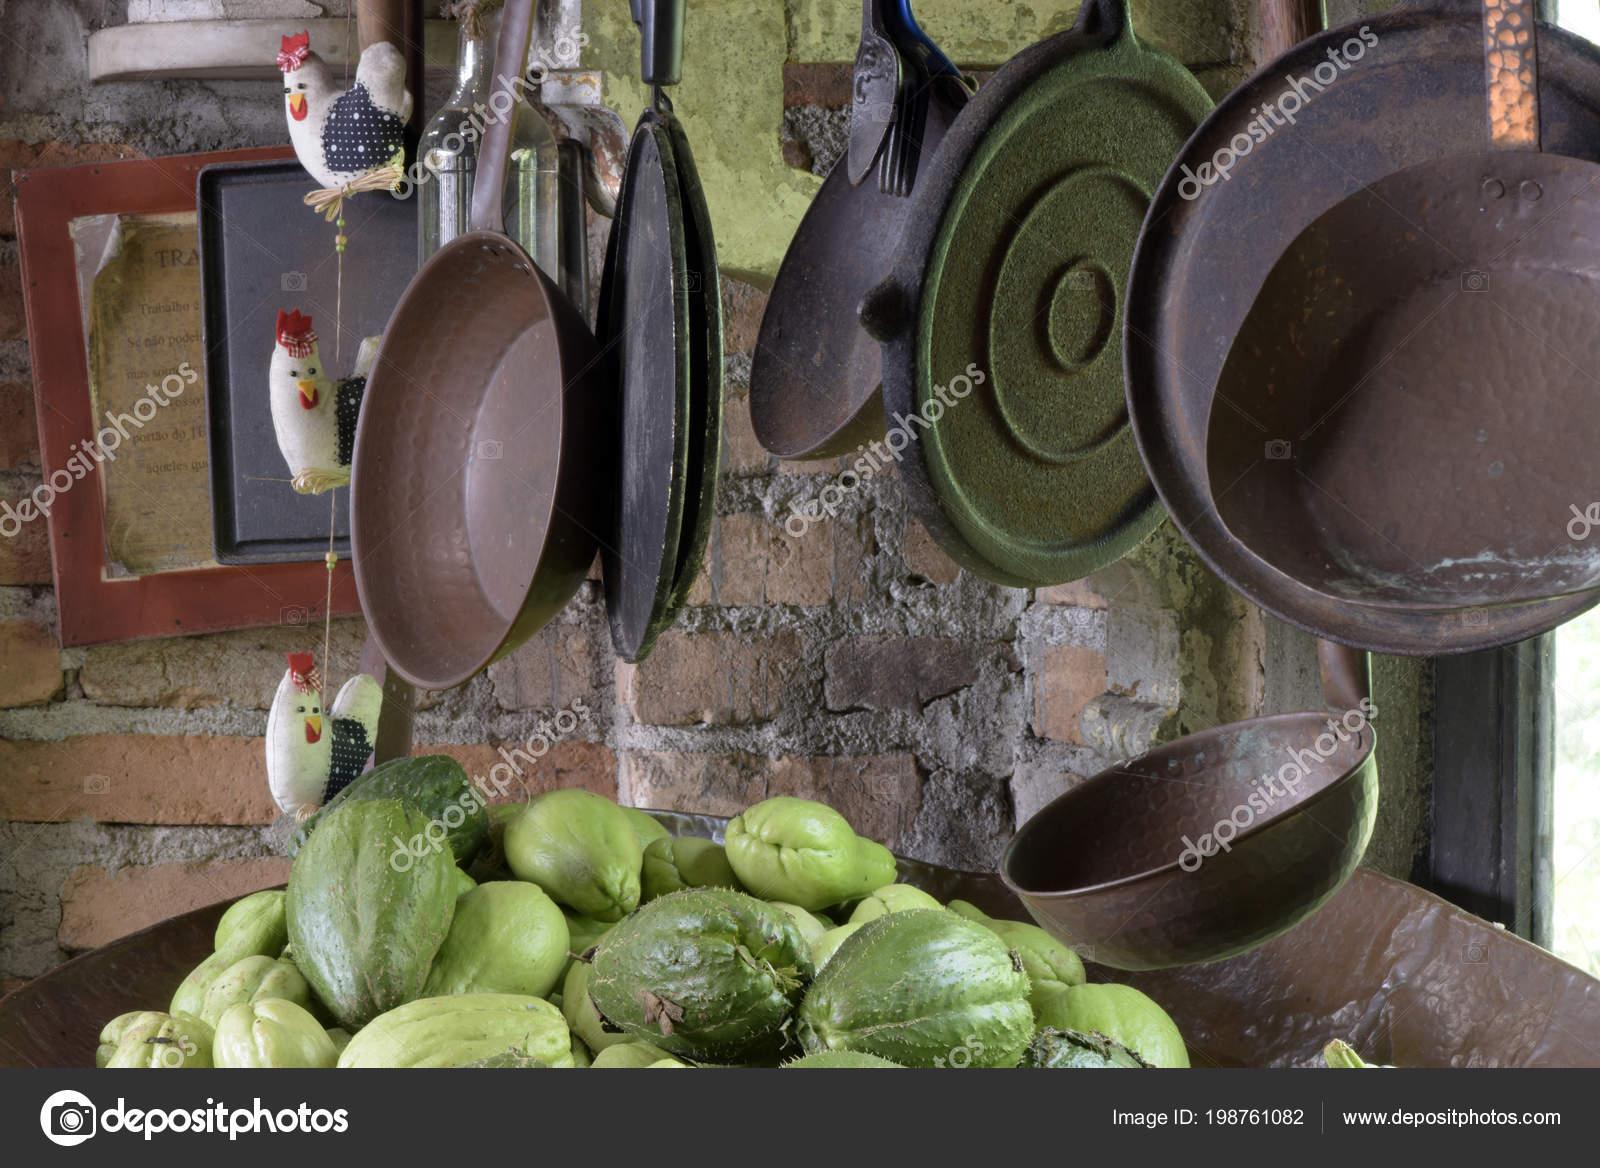 copper kitchen accents 60 inch table 铜和铁壶和平底锅作为厨房装饰元素和茶水间 图库照片 c jaboticabafotos 图库